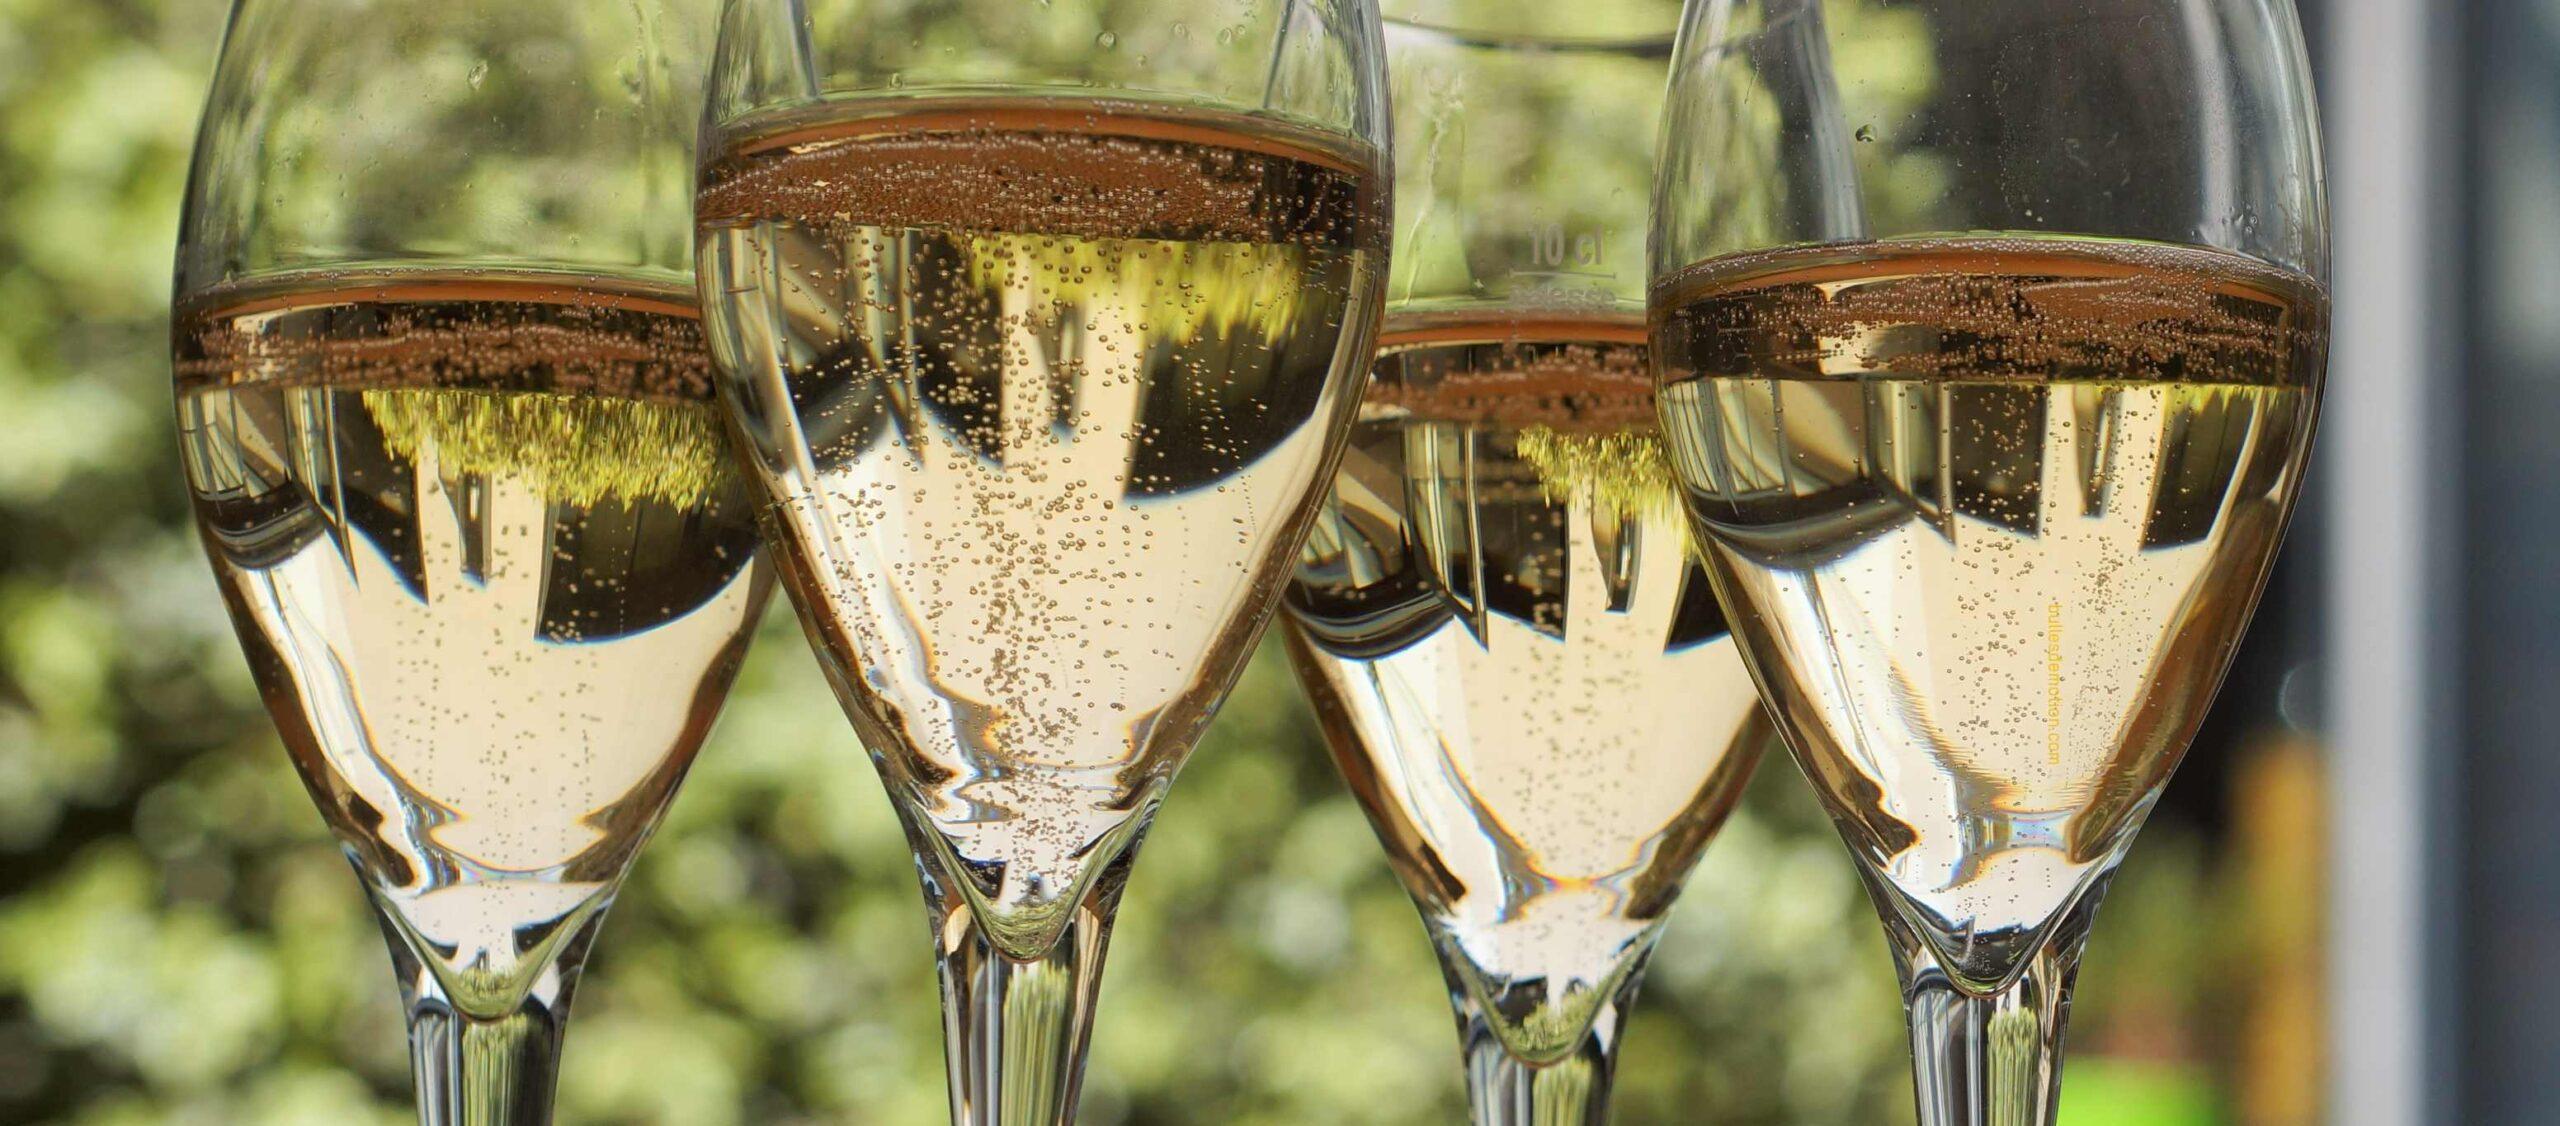 Pale gold sparkling Chardonnay